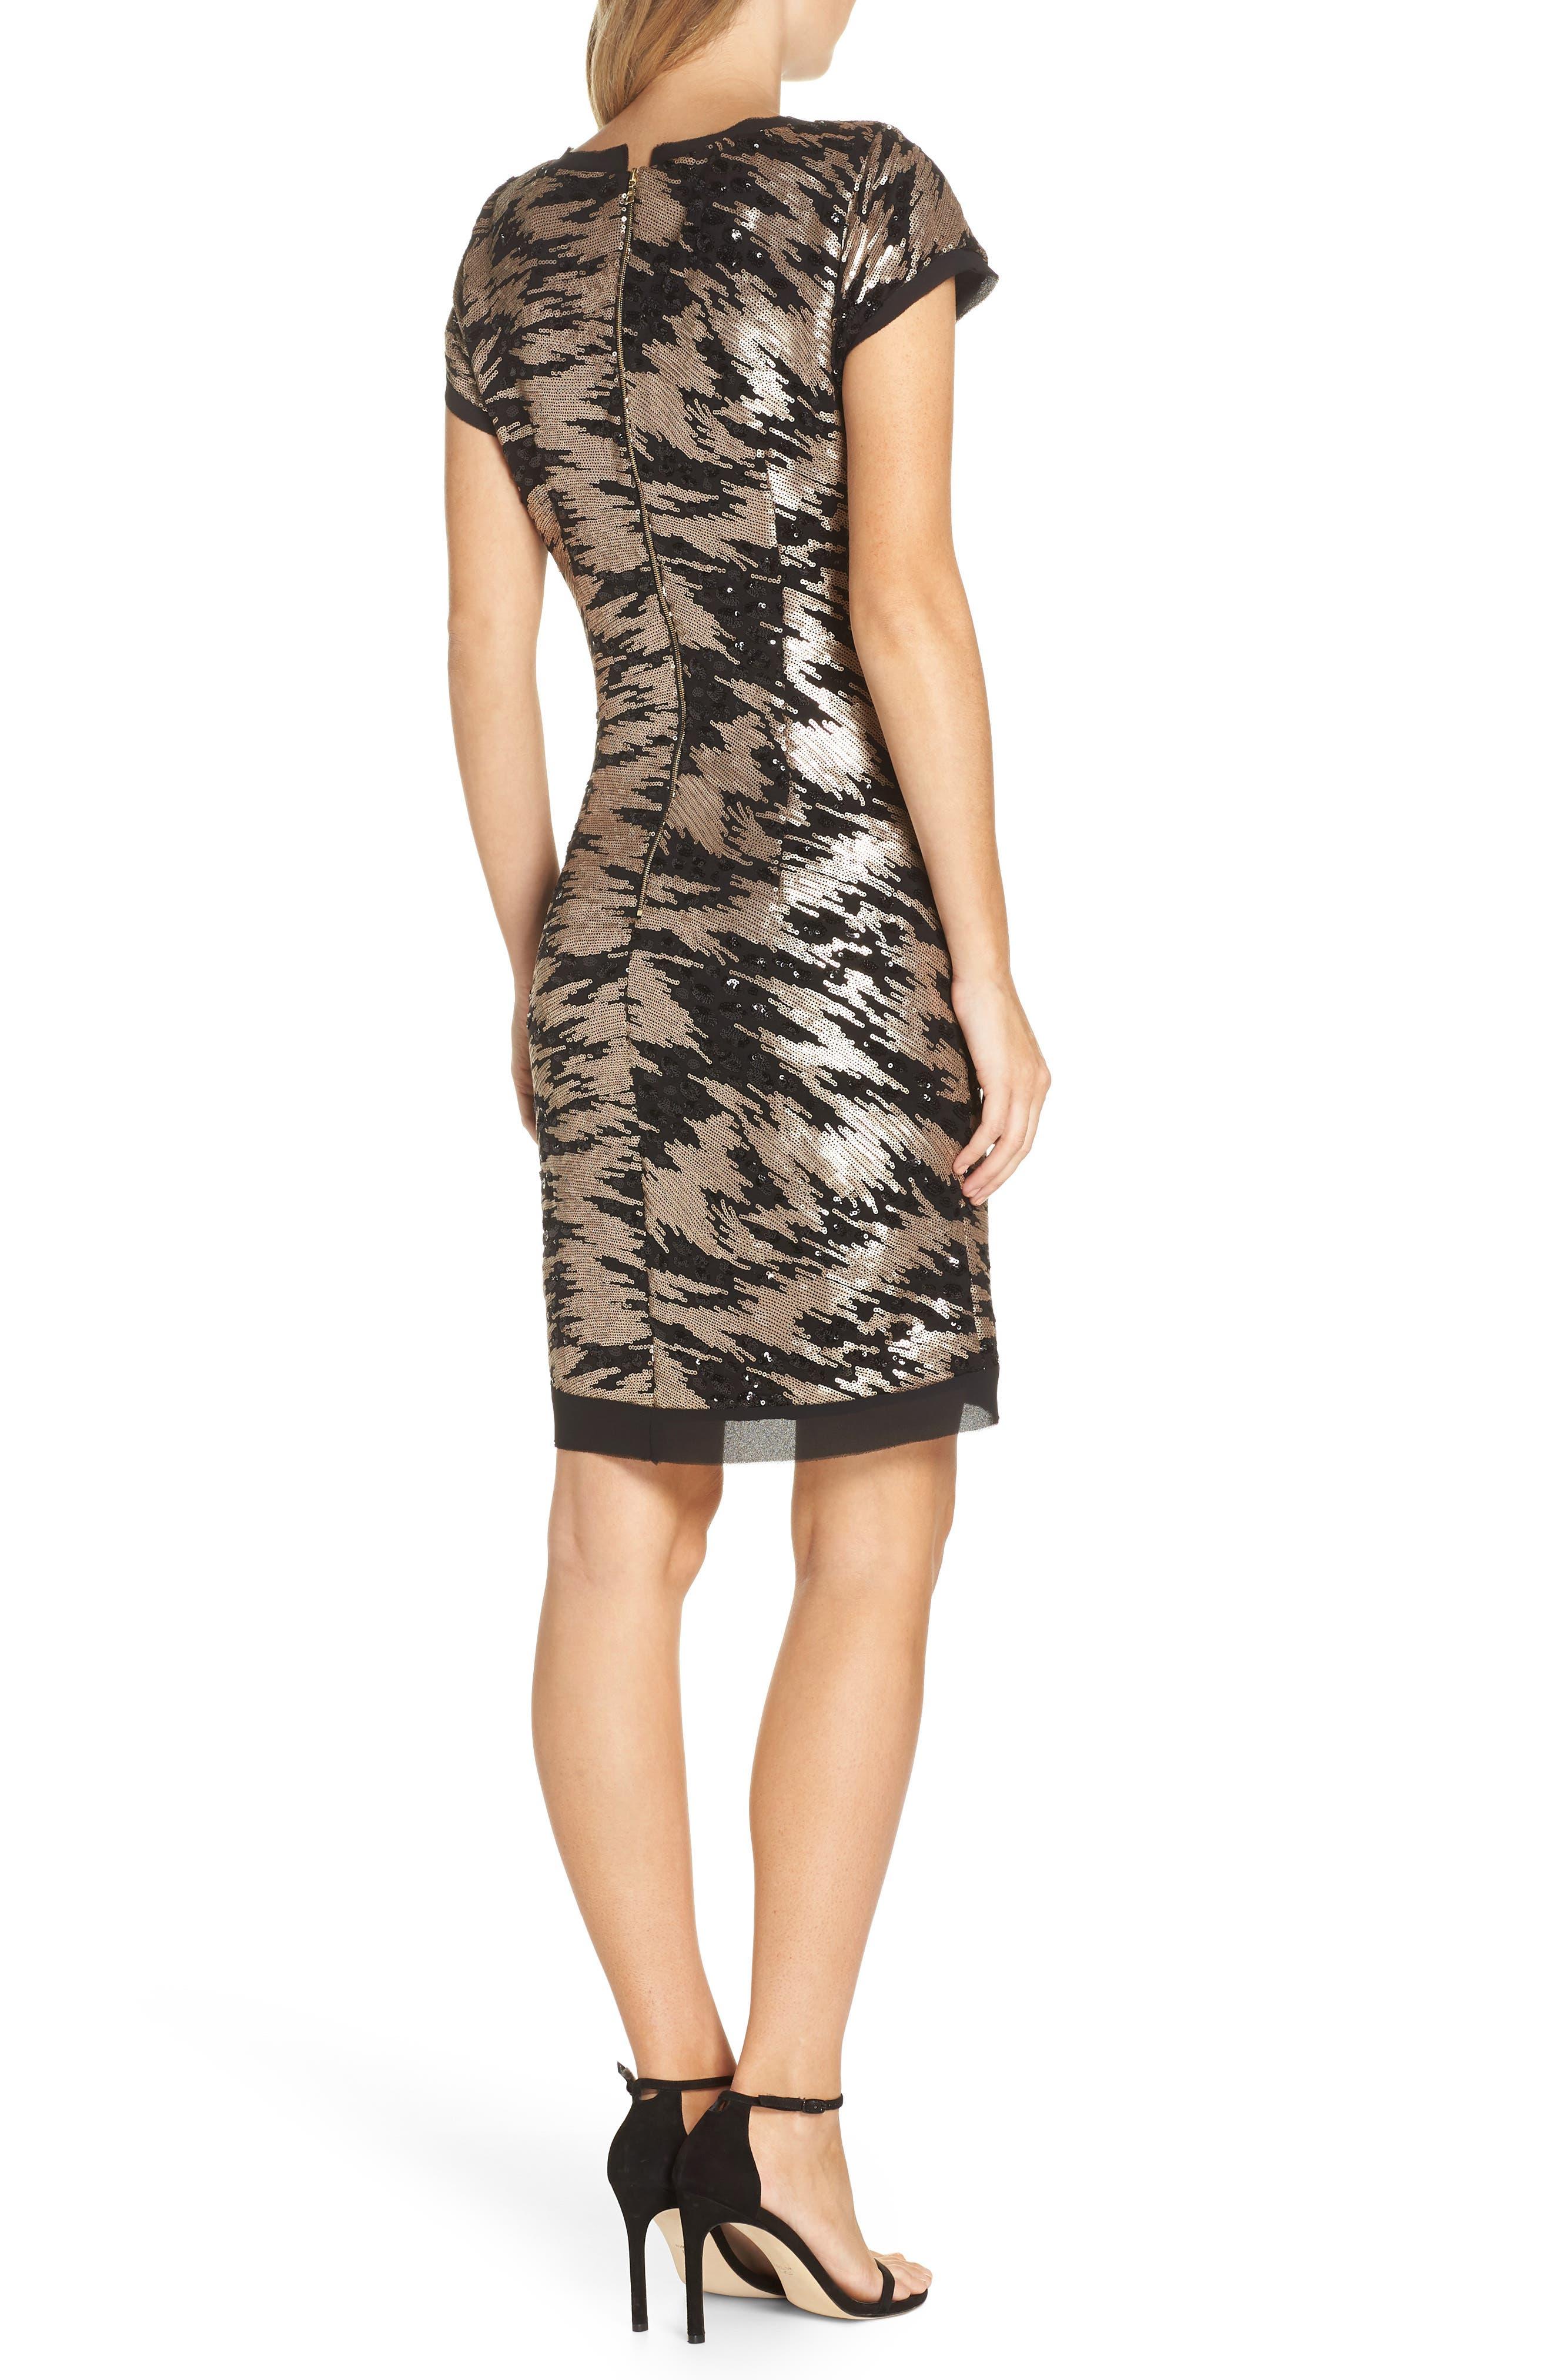 ELIZA J, Sequin Sheath Dress, Alternate thumbnail 2, color, BLACK/ GOLD